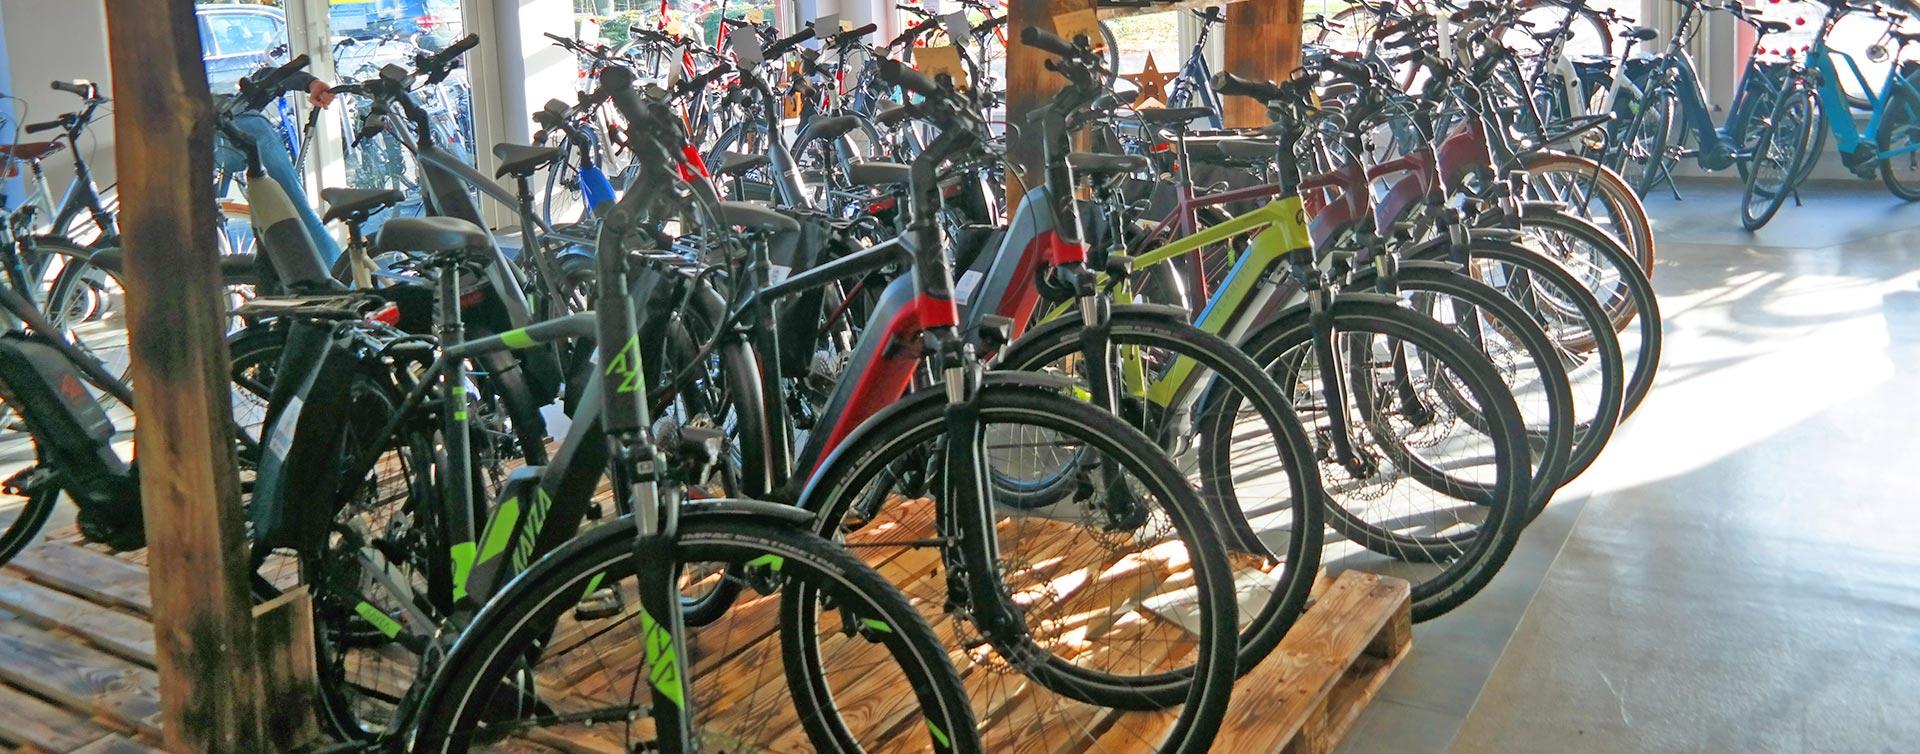 Bike & Garden Bobrink - E-Bikes